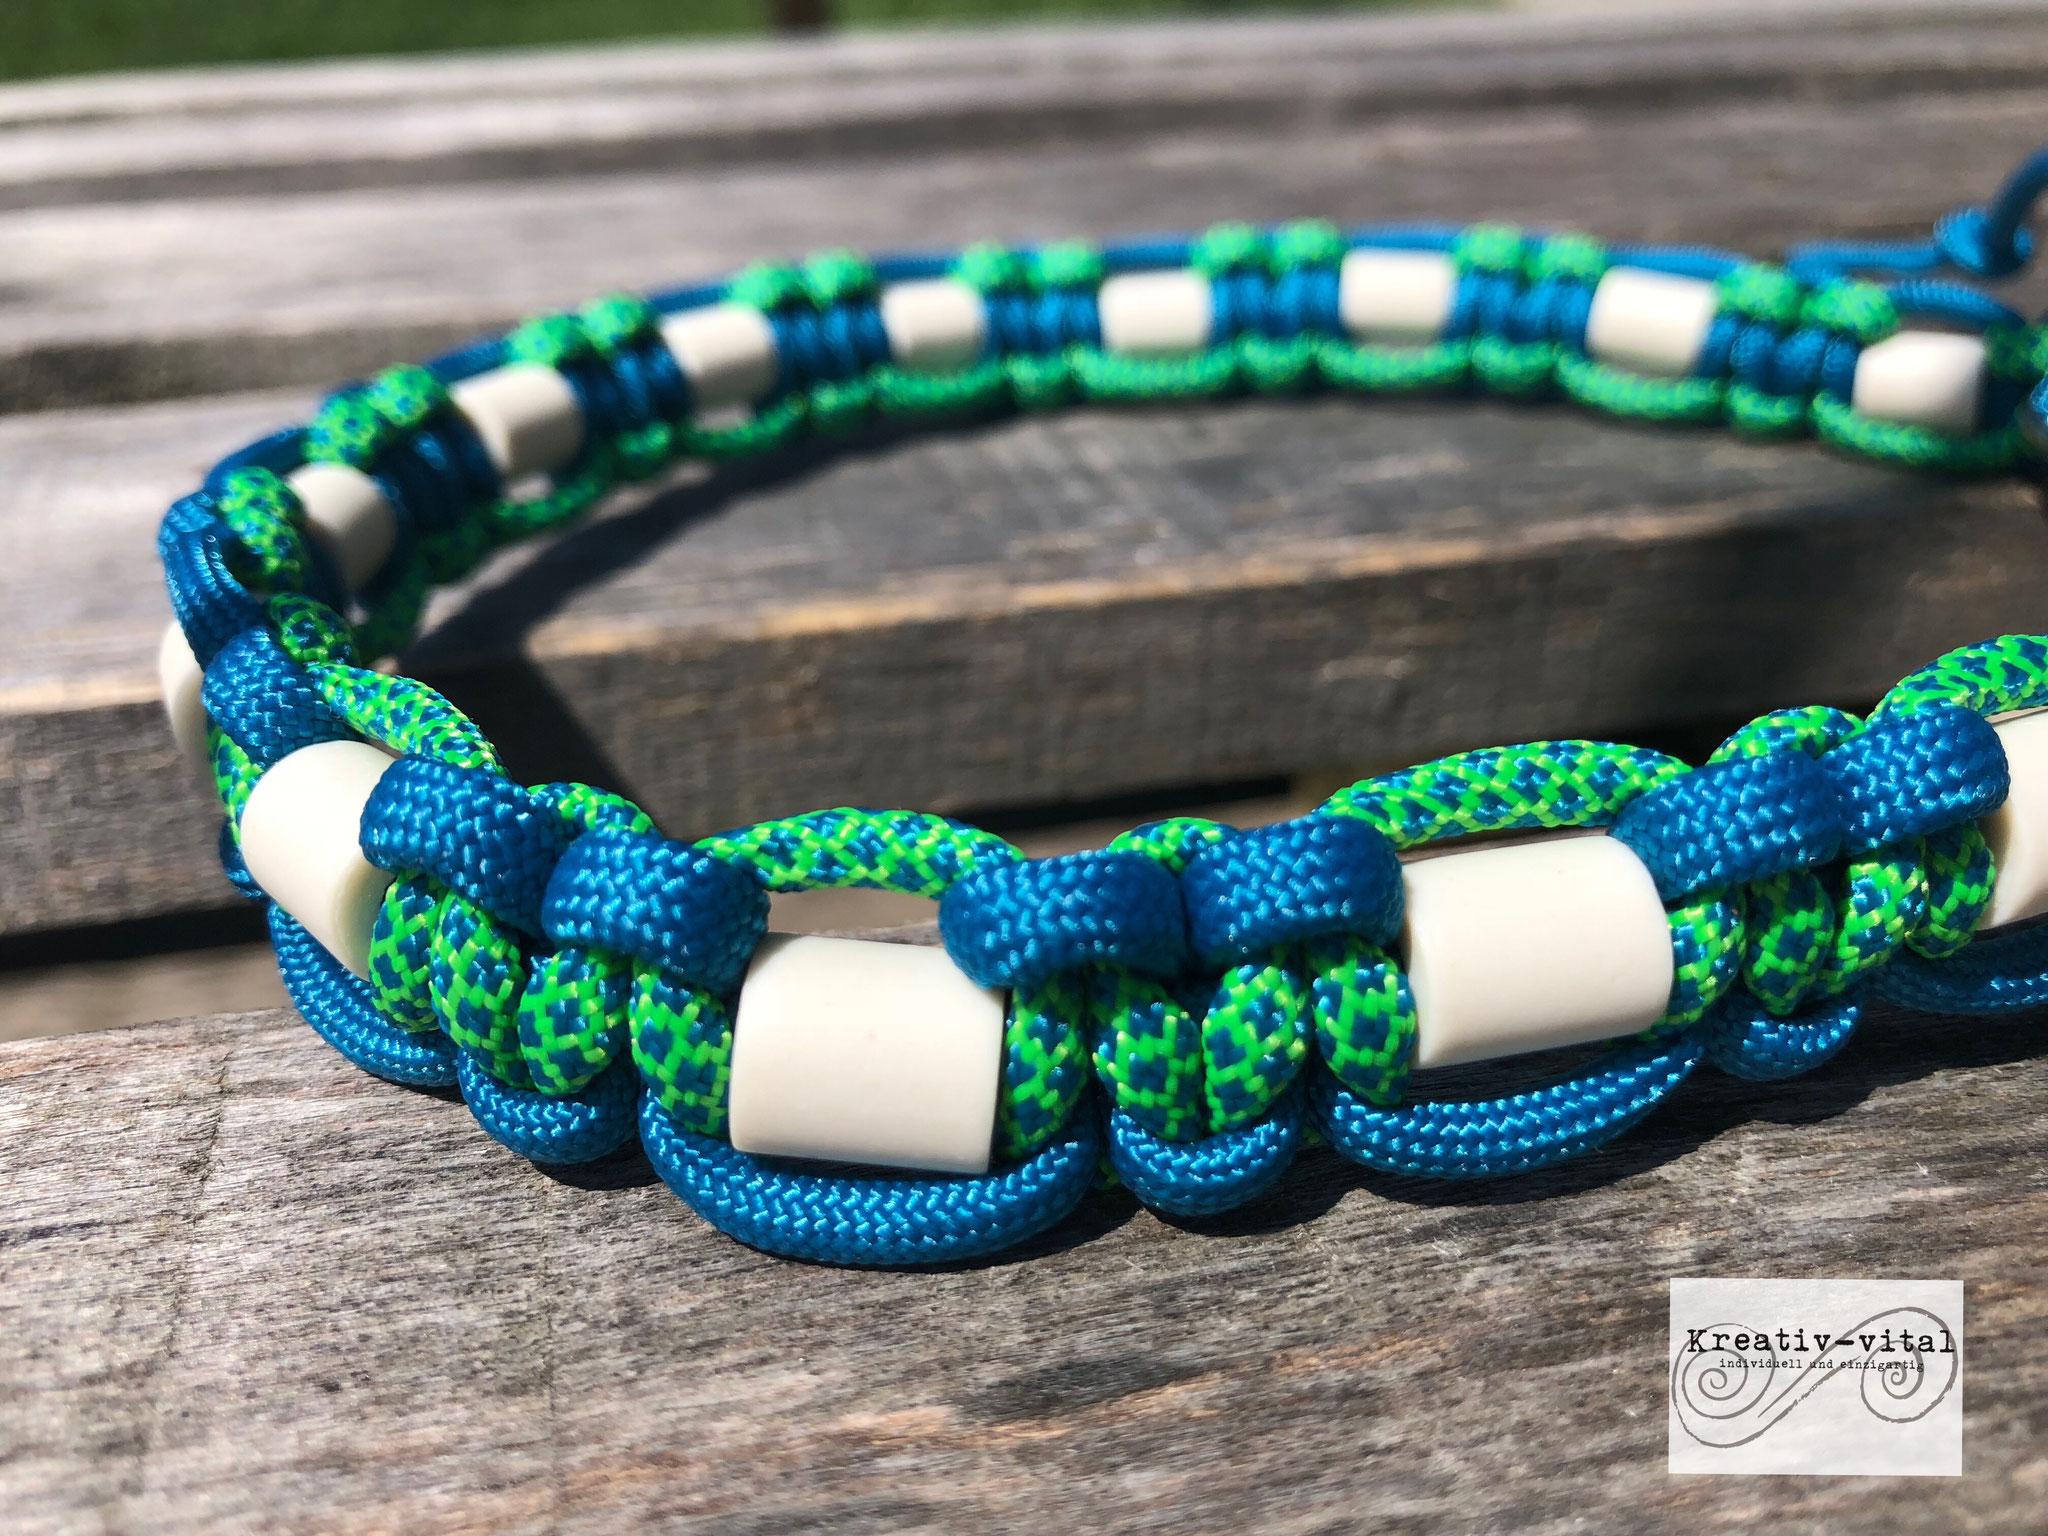 EM Keramik Halsband für Hund/Katze 46-50cm Halsumfang Caribbean Blue/neon green Caribbean blue